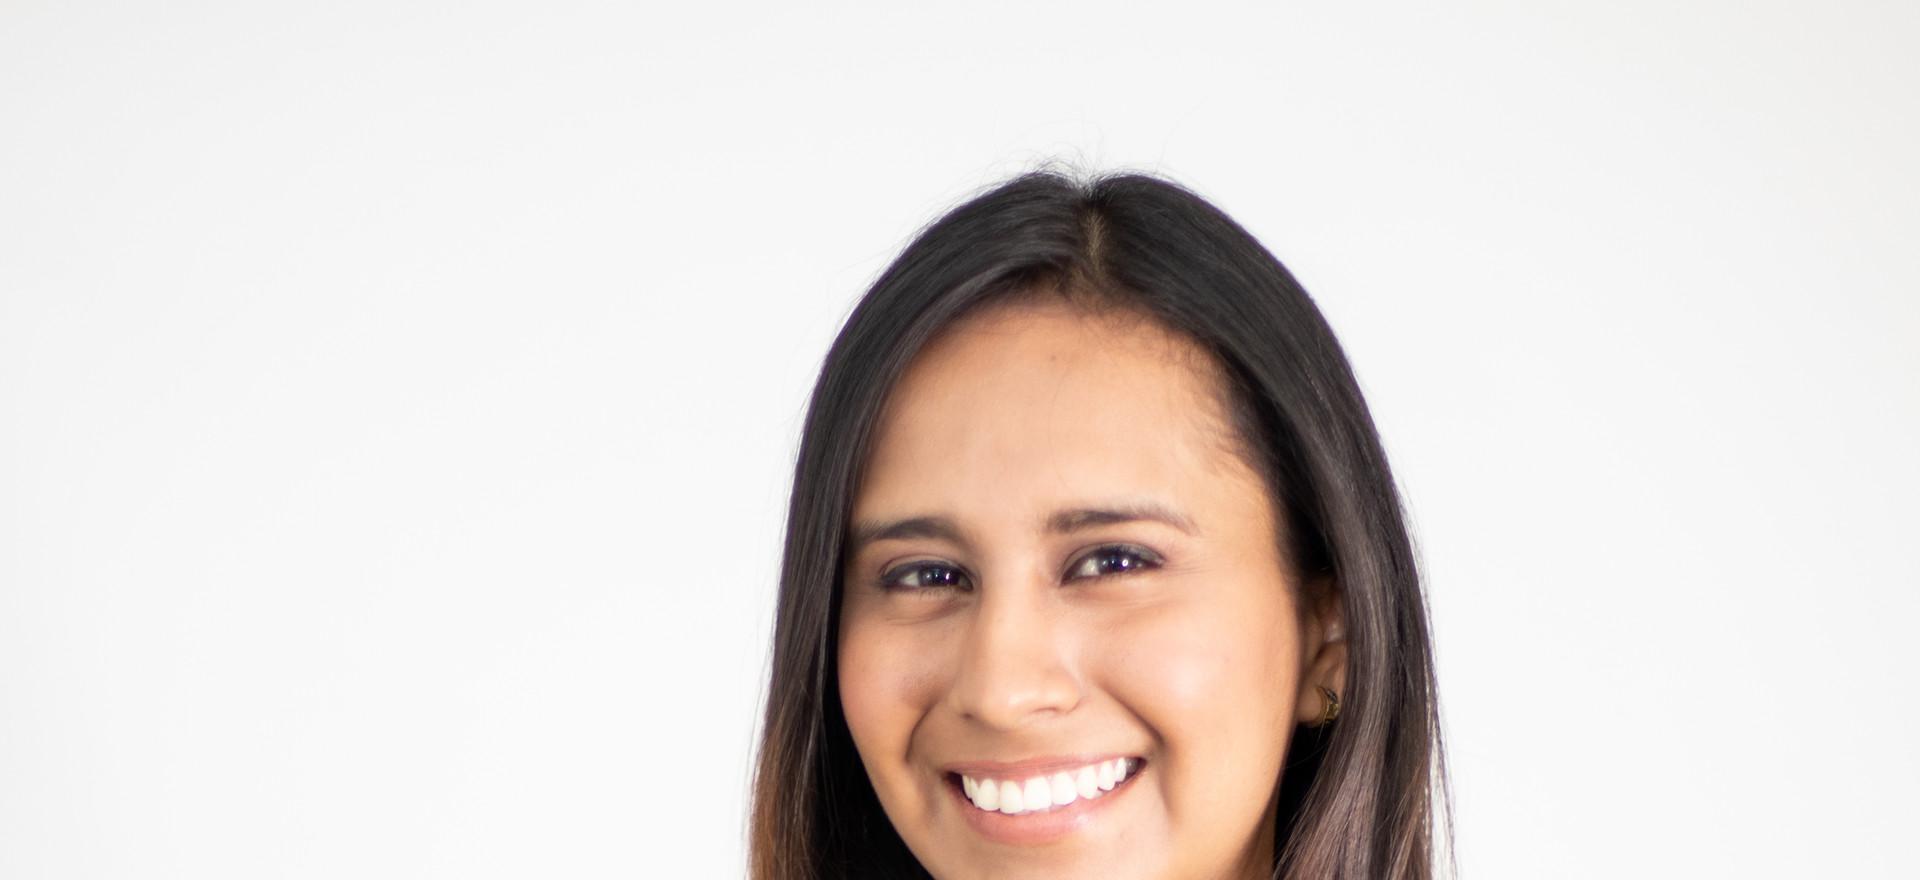 Maria-Bautista-07.20.2020-9944.JPG